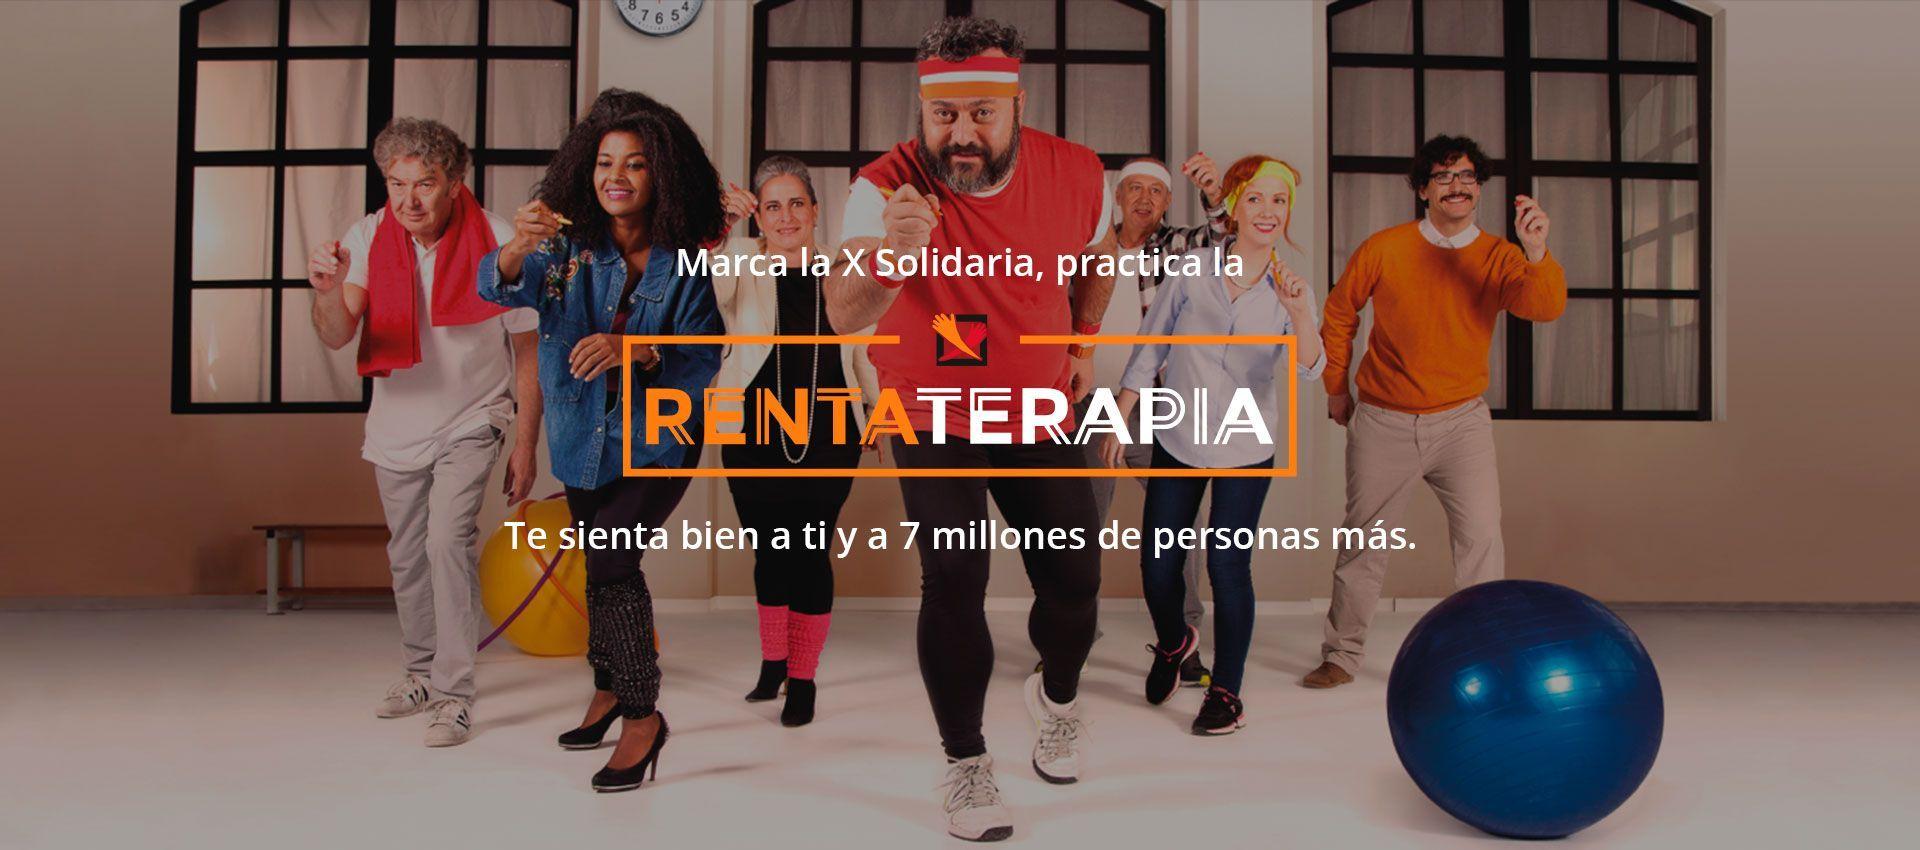 1489419258 Rentaterapia - MdM España